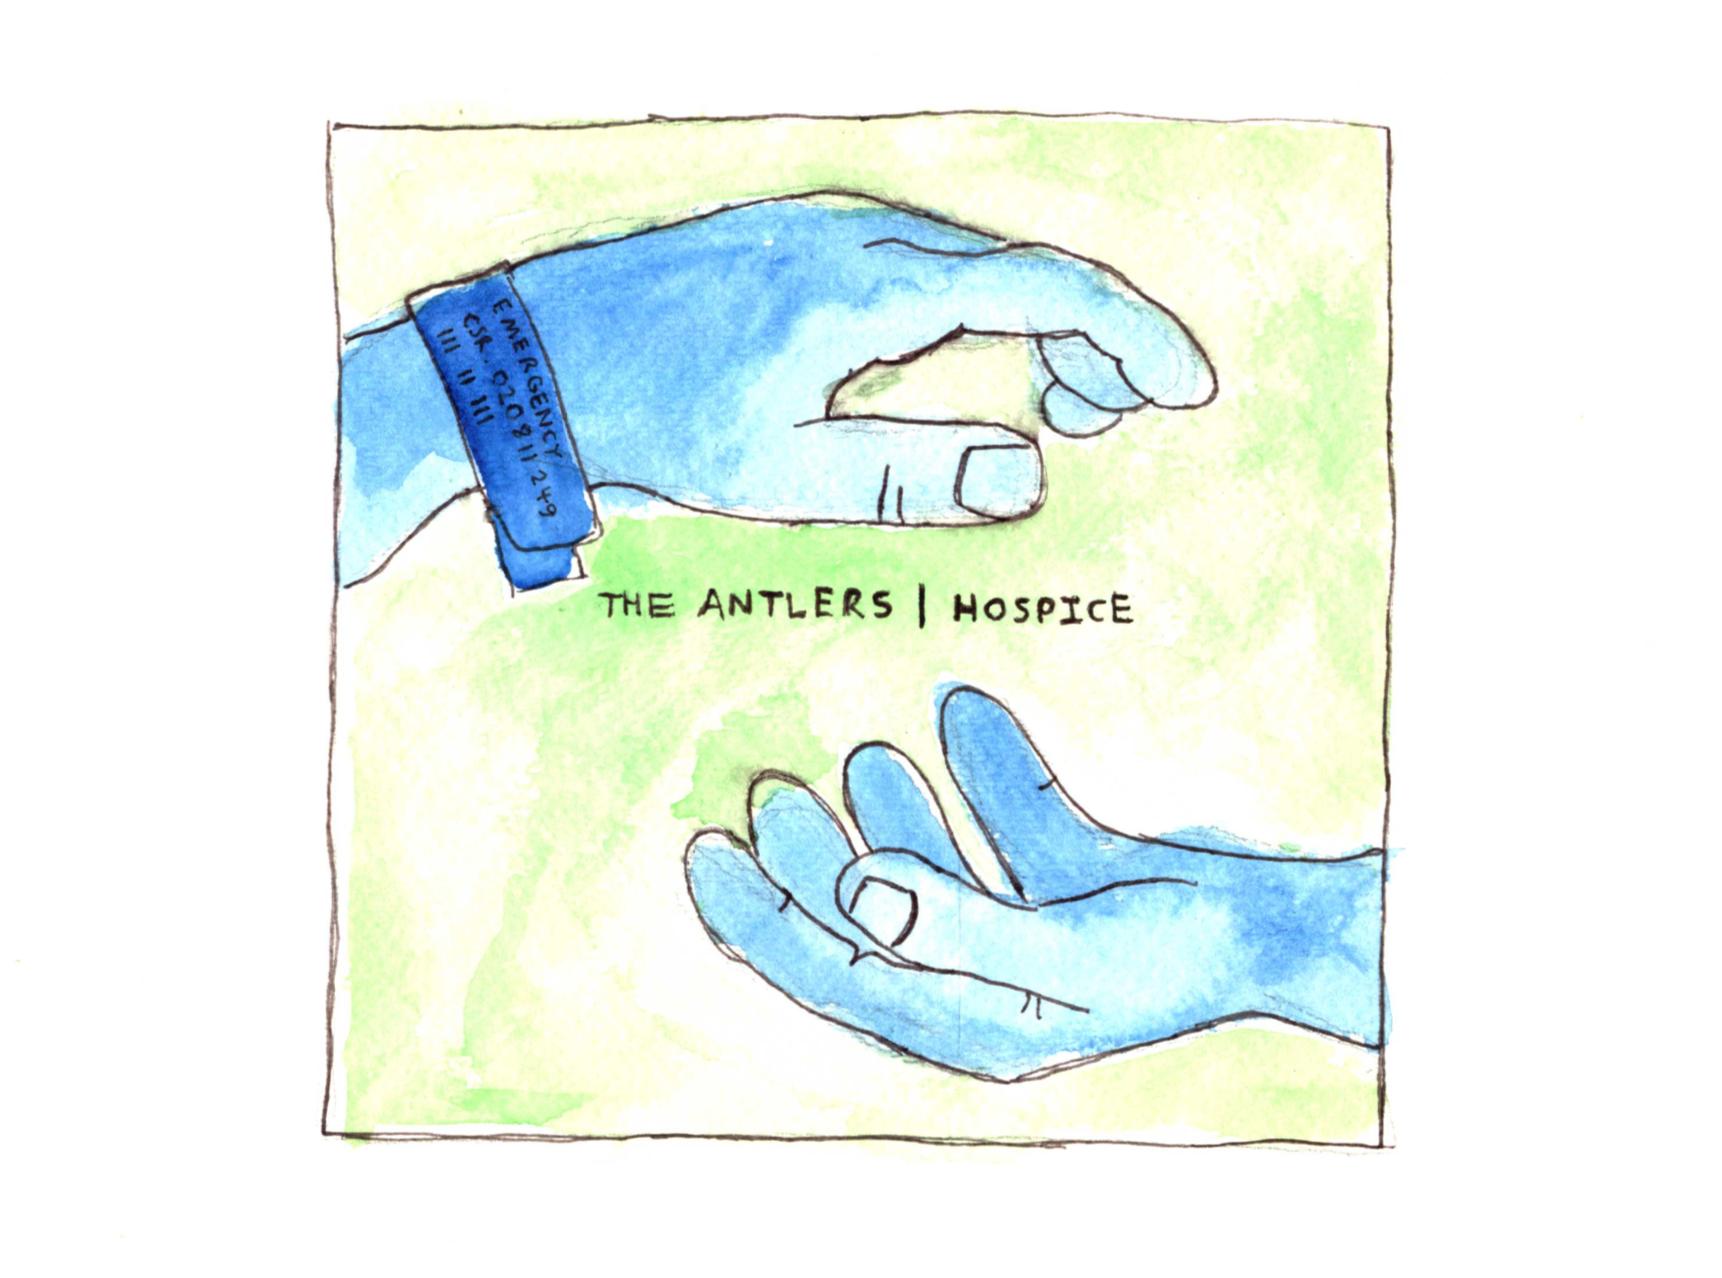 Ten Years of Hospice - Alexander Kloss